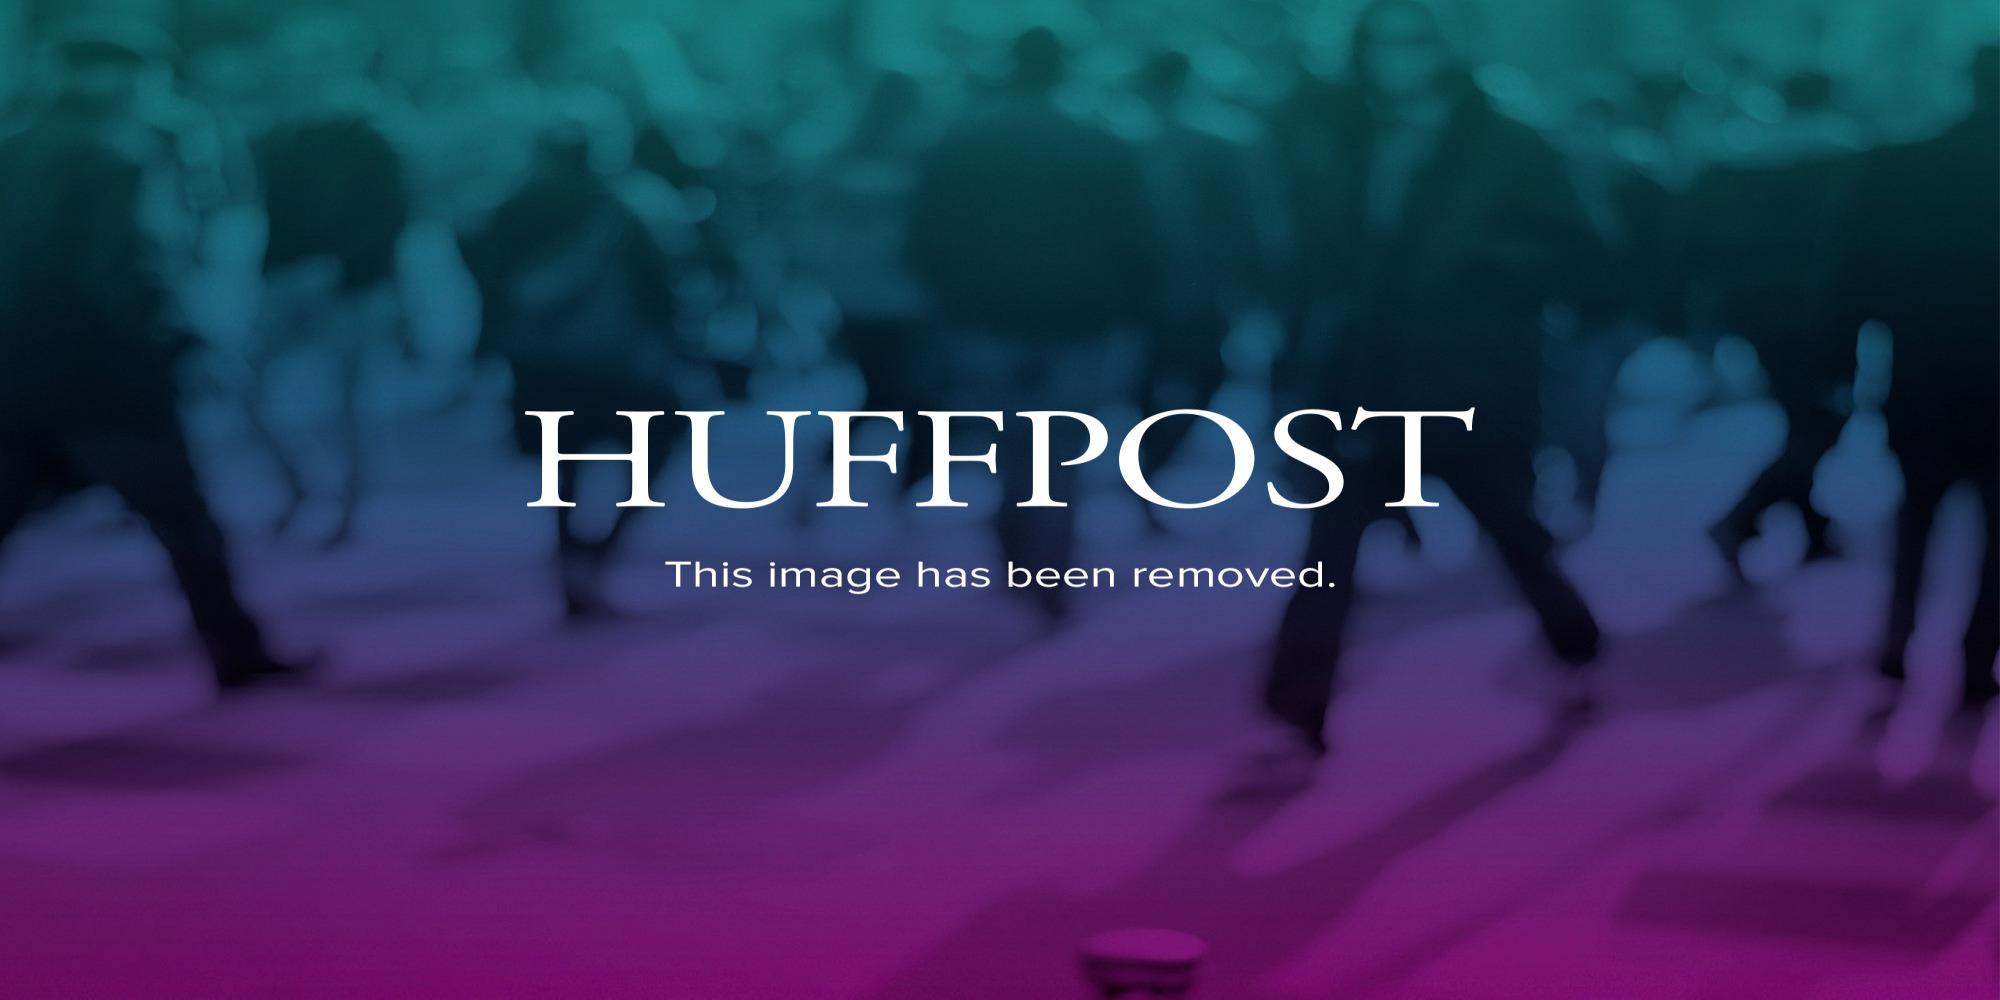 http://i.huffpost.com/gen/1947396/images/o-SCRABBLE-facebook.jpg